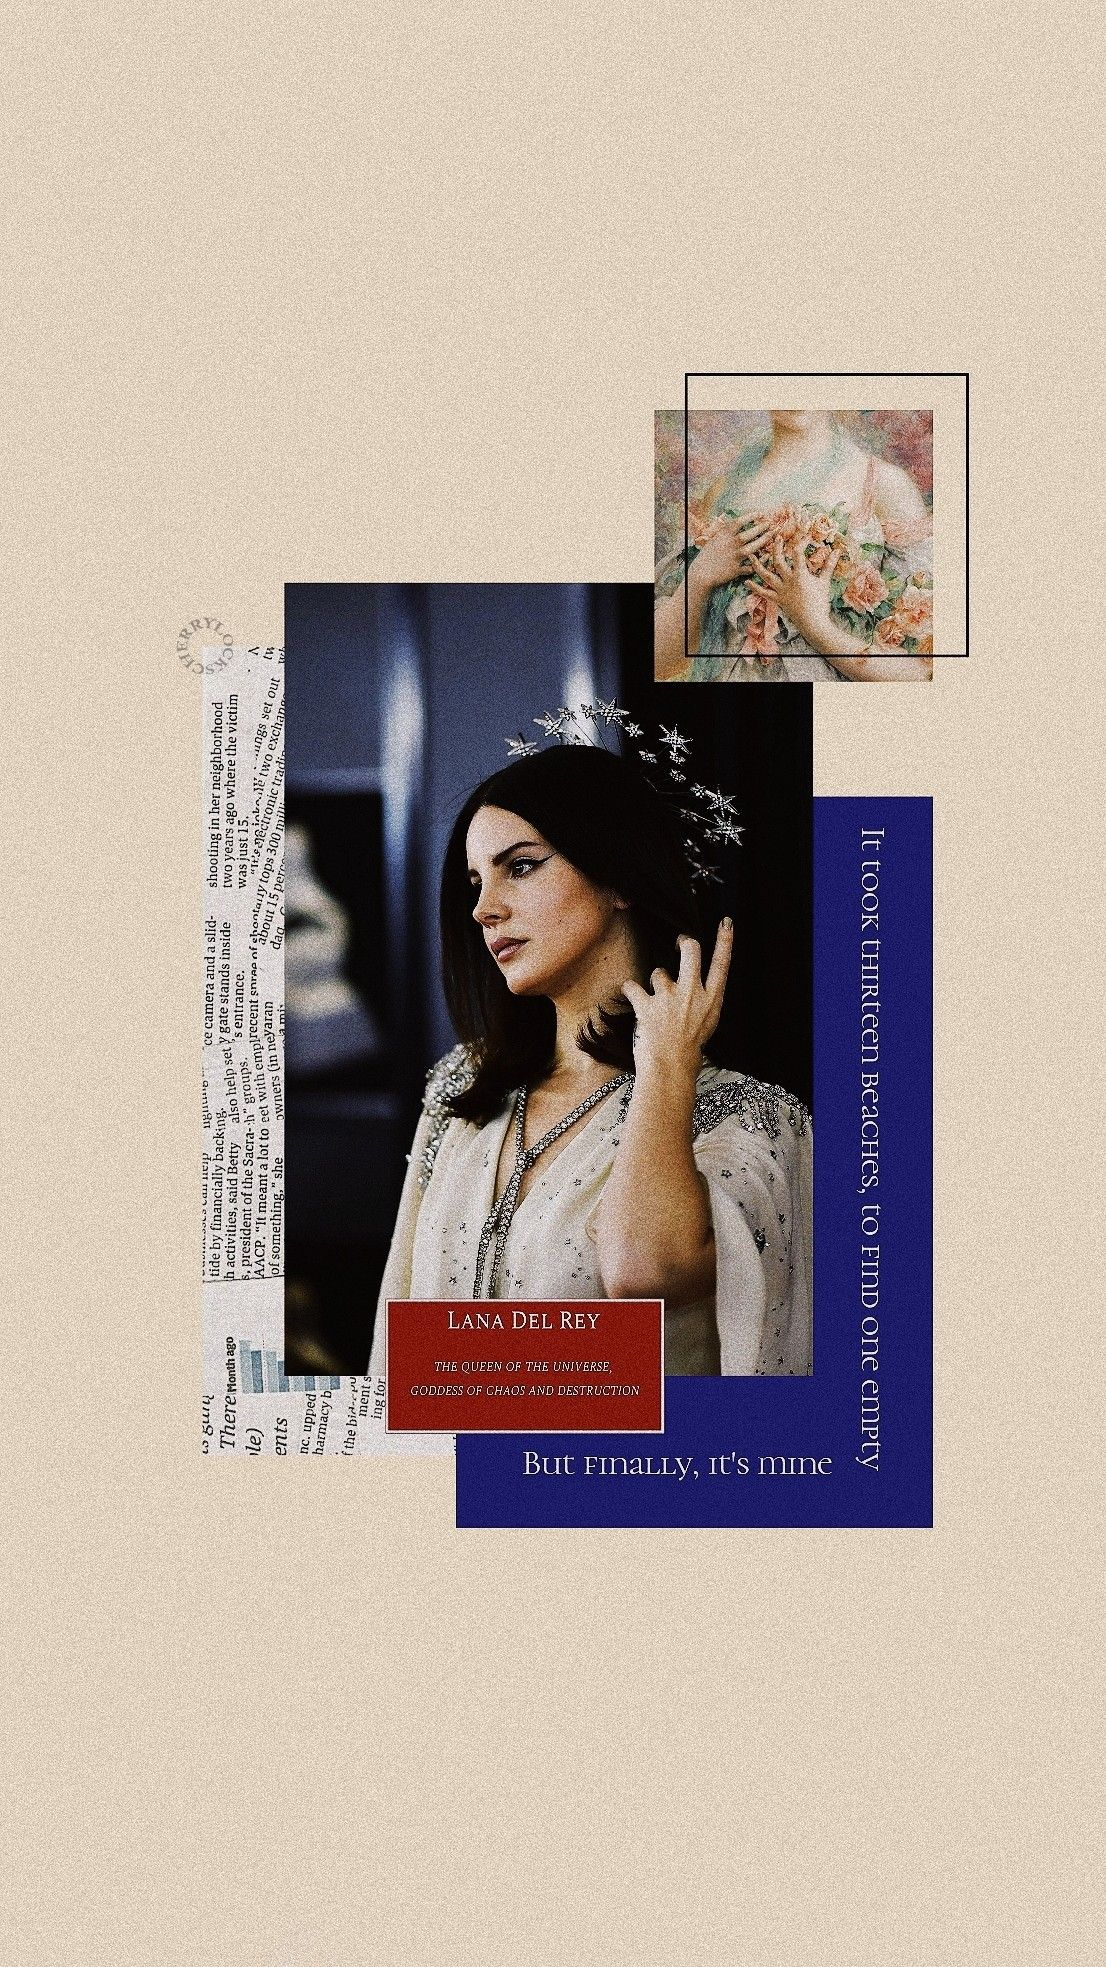 Lockscreen Lana Del Rey 13 Beaches Lana Del Rej Oboi Dlya Iphone Banner